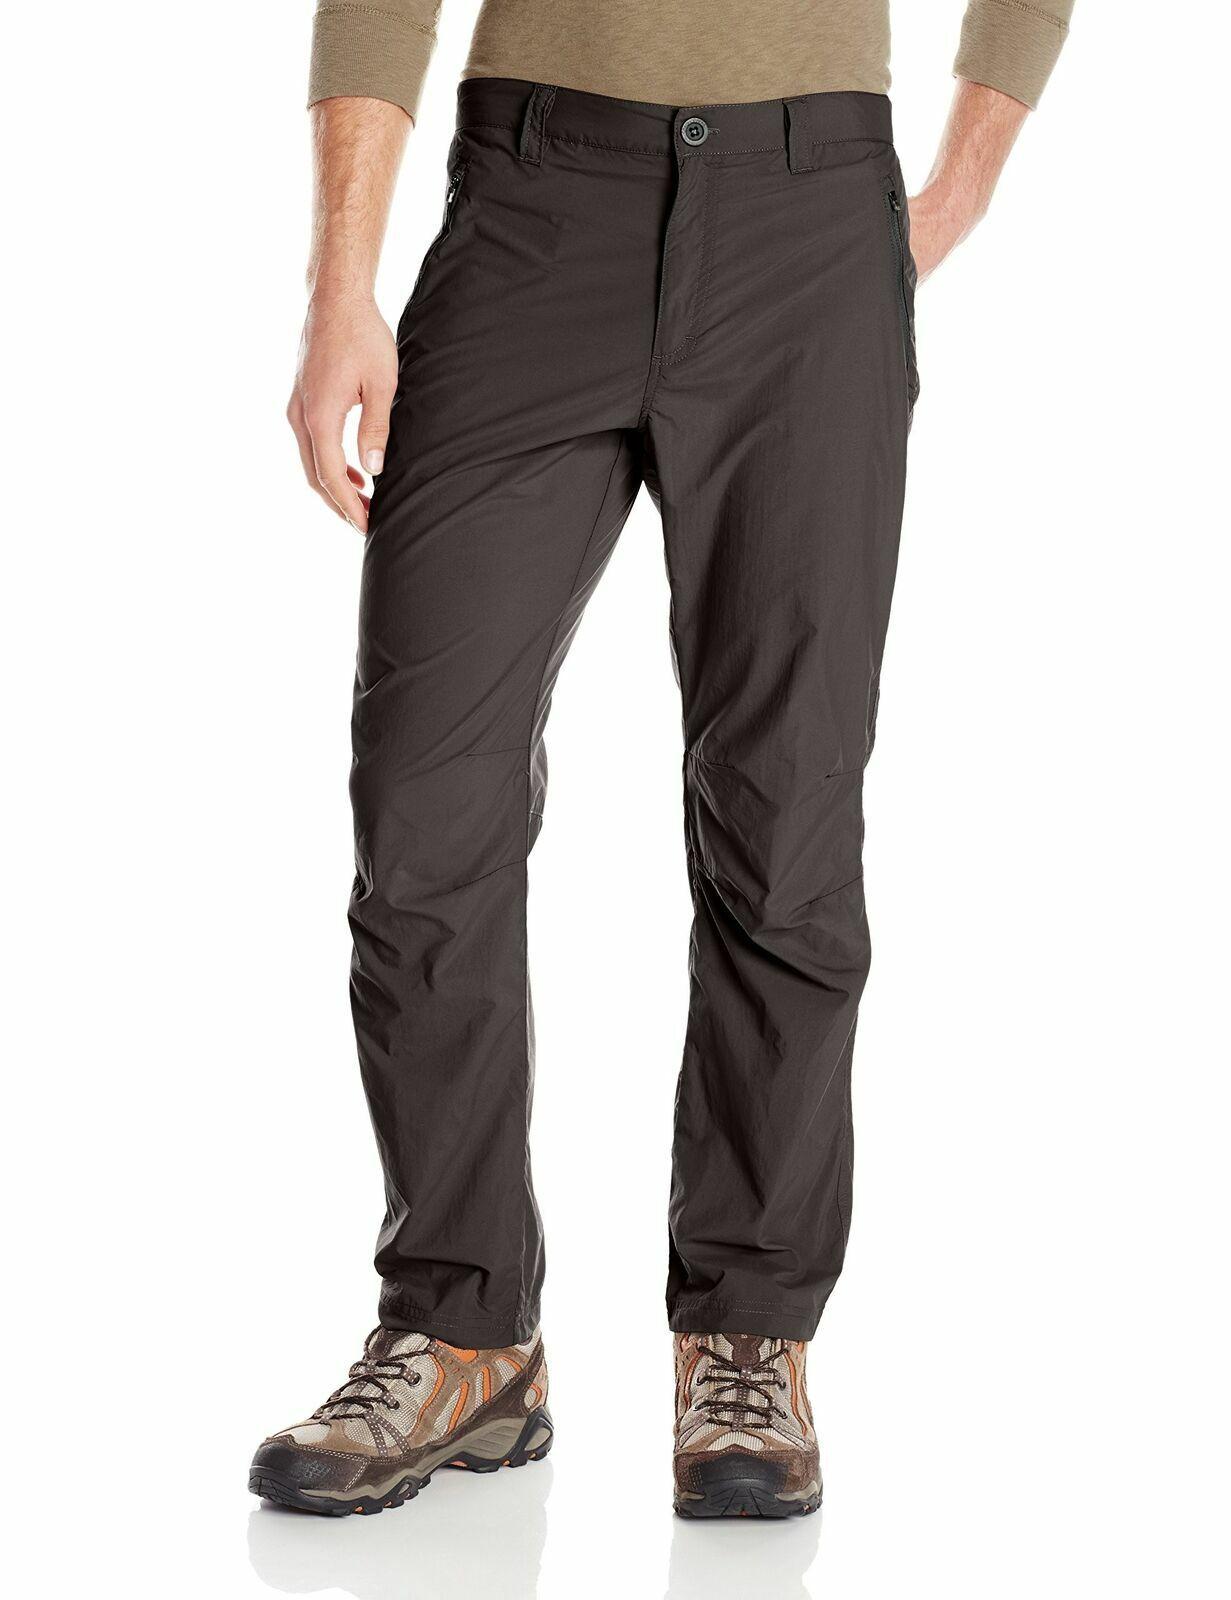 W 30-42 Men/'s Bi-Stretch Trousers Straight Leg Zip Fly Pant Black Sizes